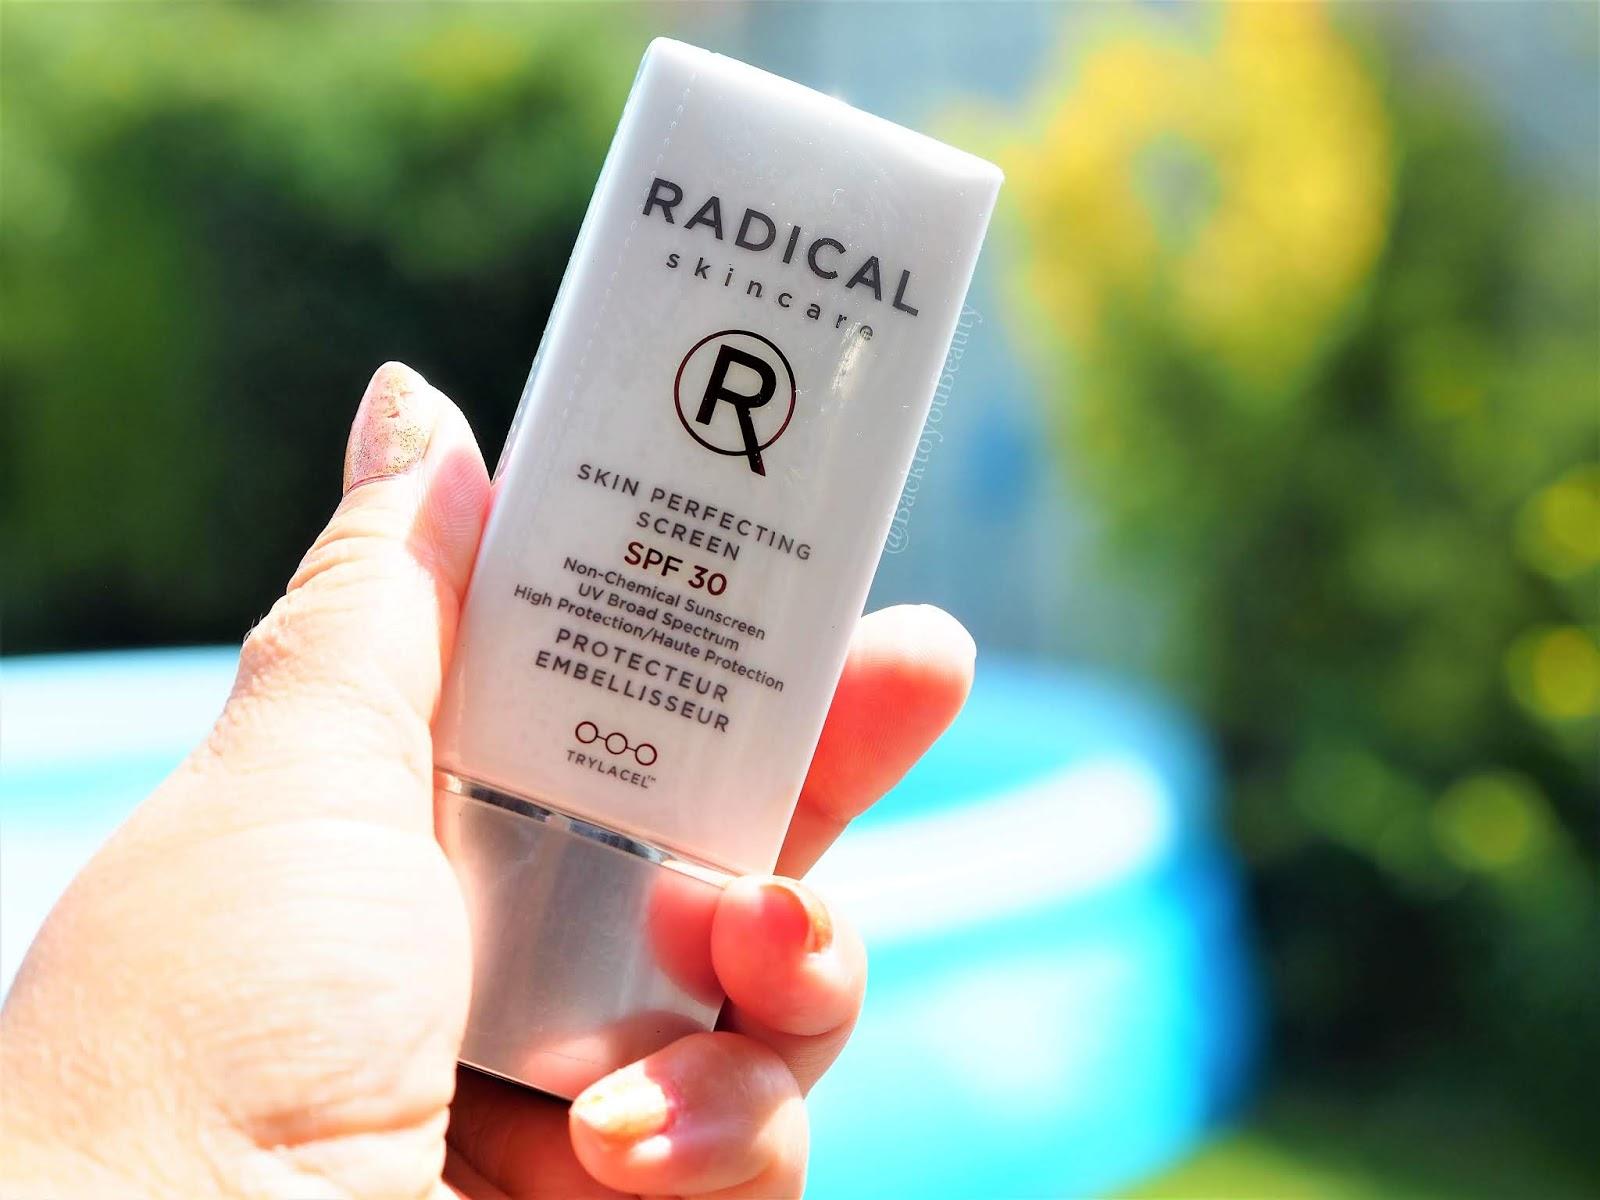 Radical skincare spf